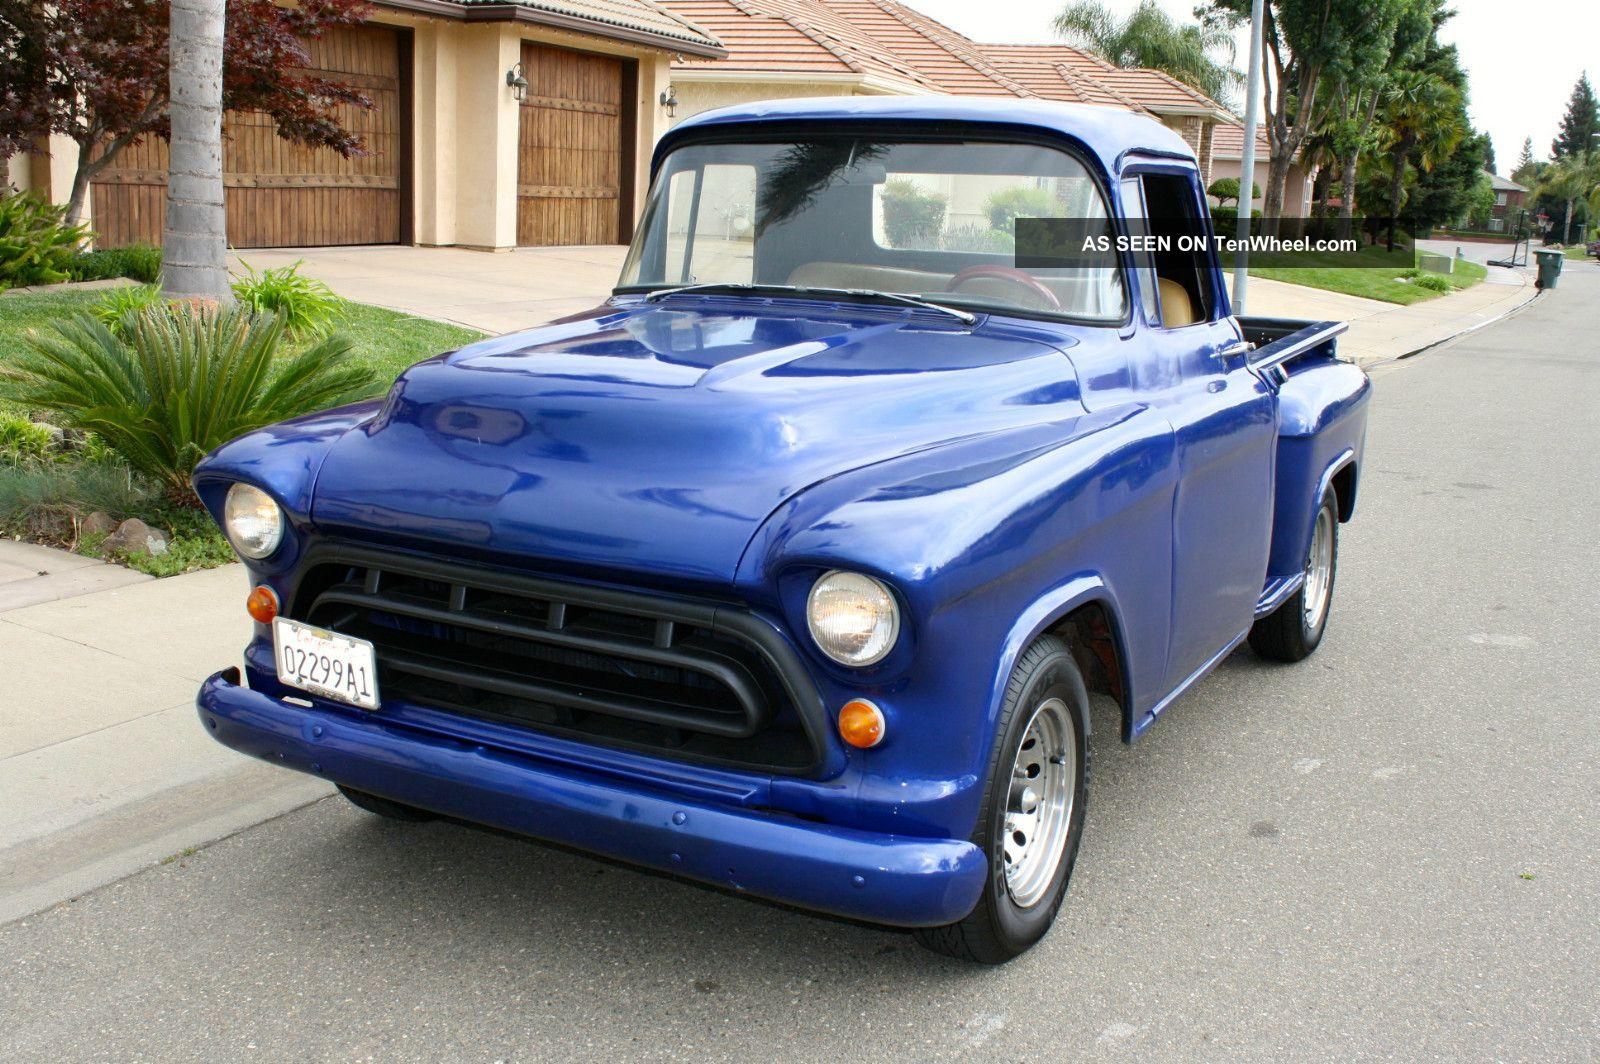 1957 Chevrolet Stepside Pickup Short Bed Hot Rod 1955 1956 Chevy Truck 1958 1959